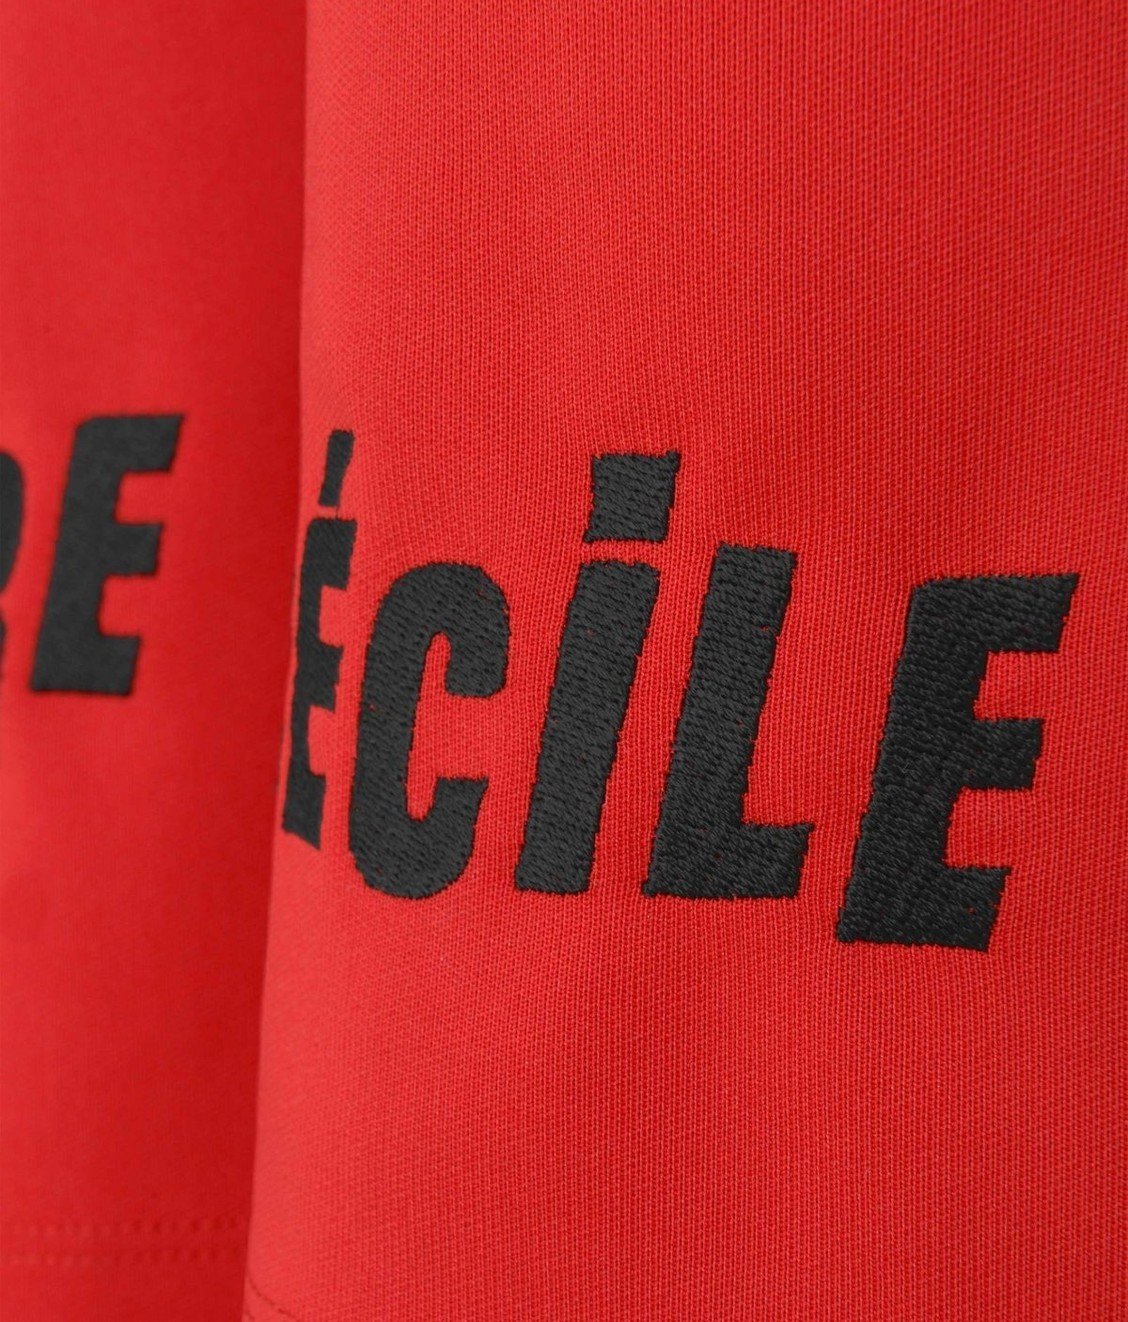 Etre Cecile Etre Cecile Chevron Track Pant Red